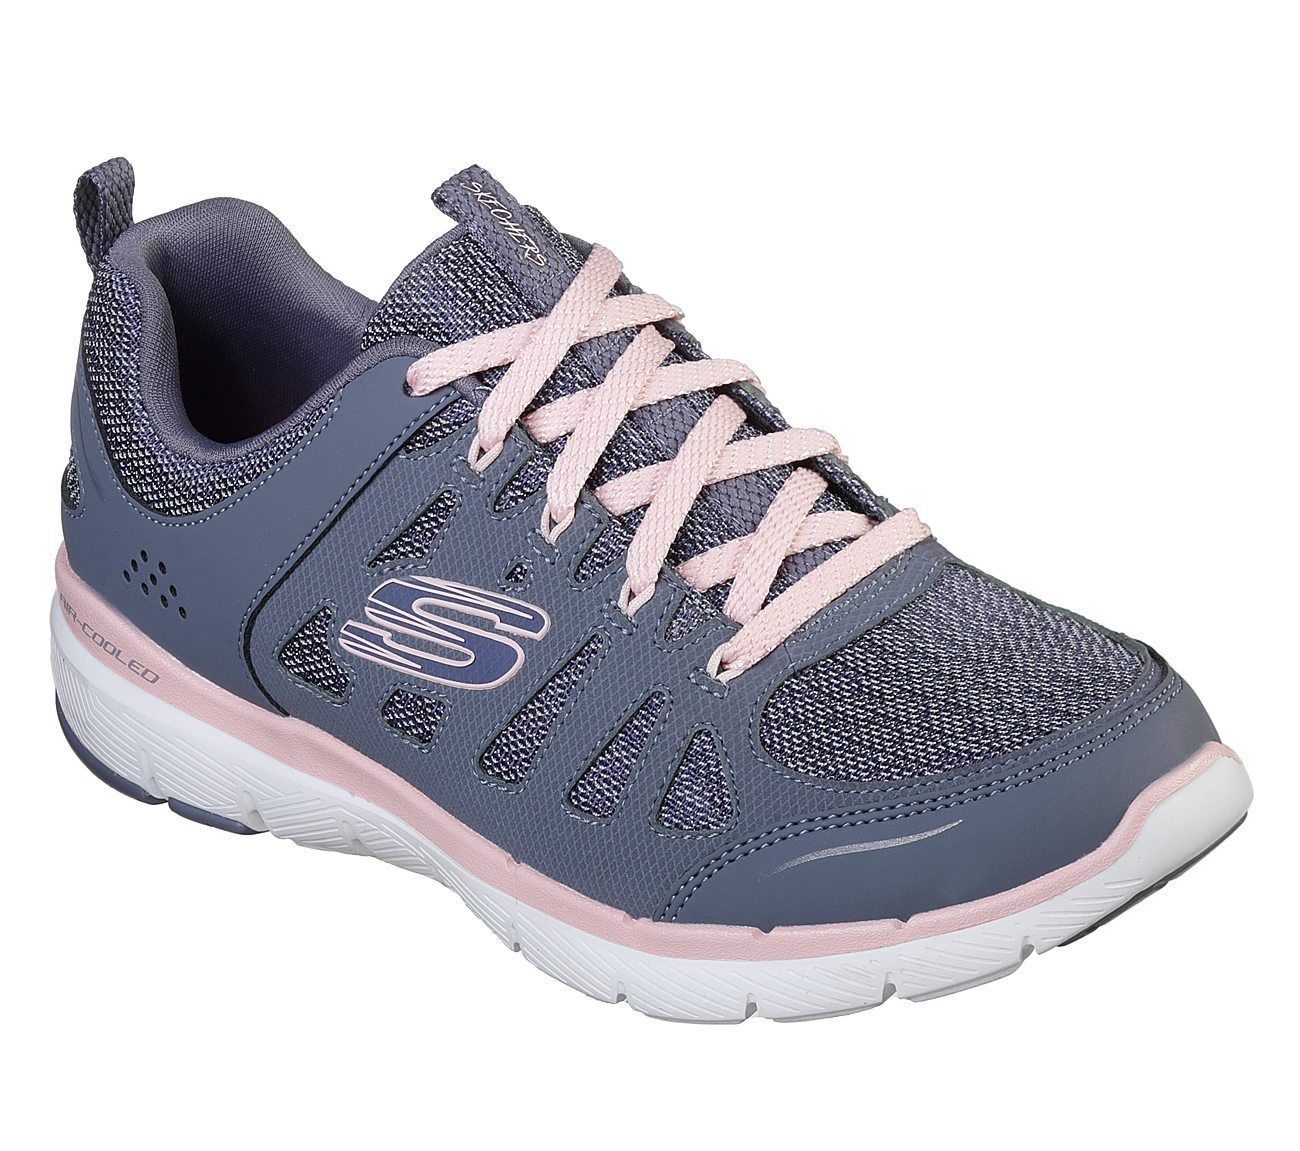 Skechers Flex Appeal 3.0 Billow Damenschuhe Memory Walking Memory Damenschuhe Foam Sports ... cb459f